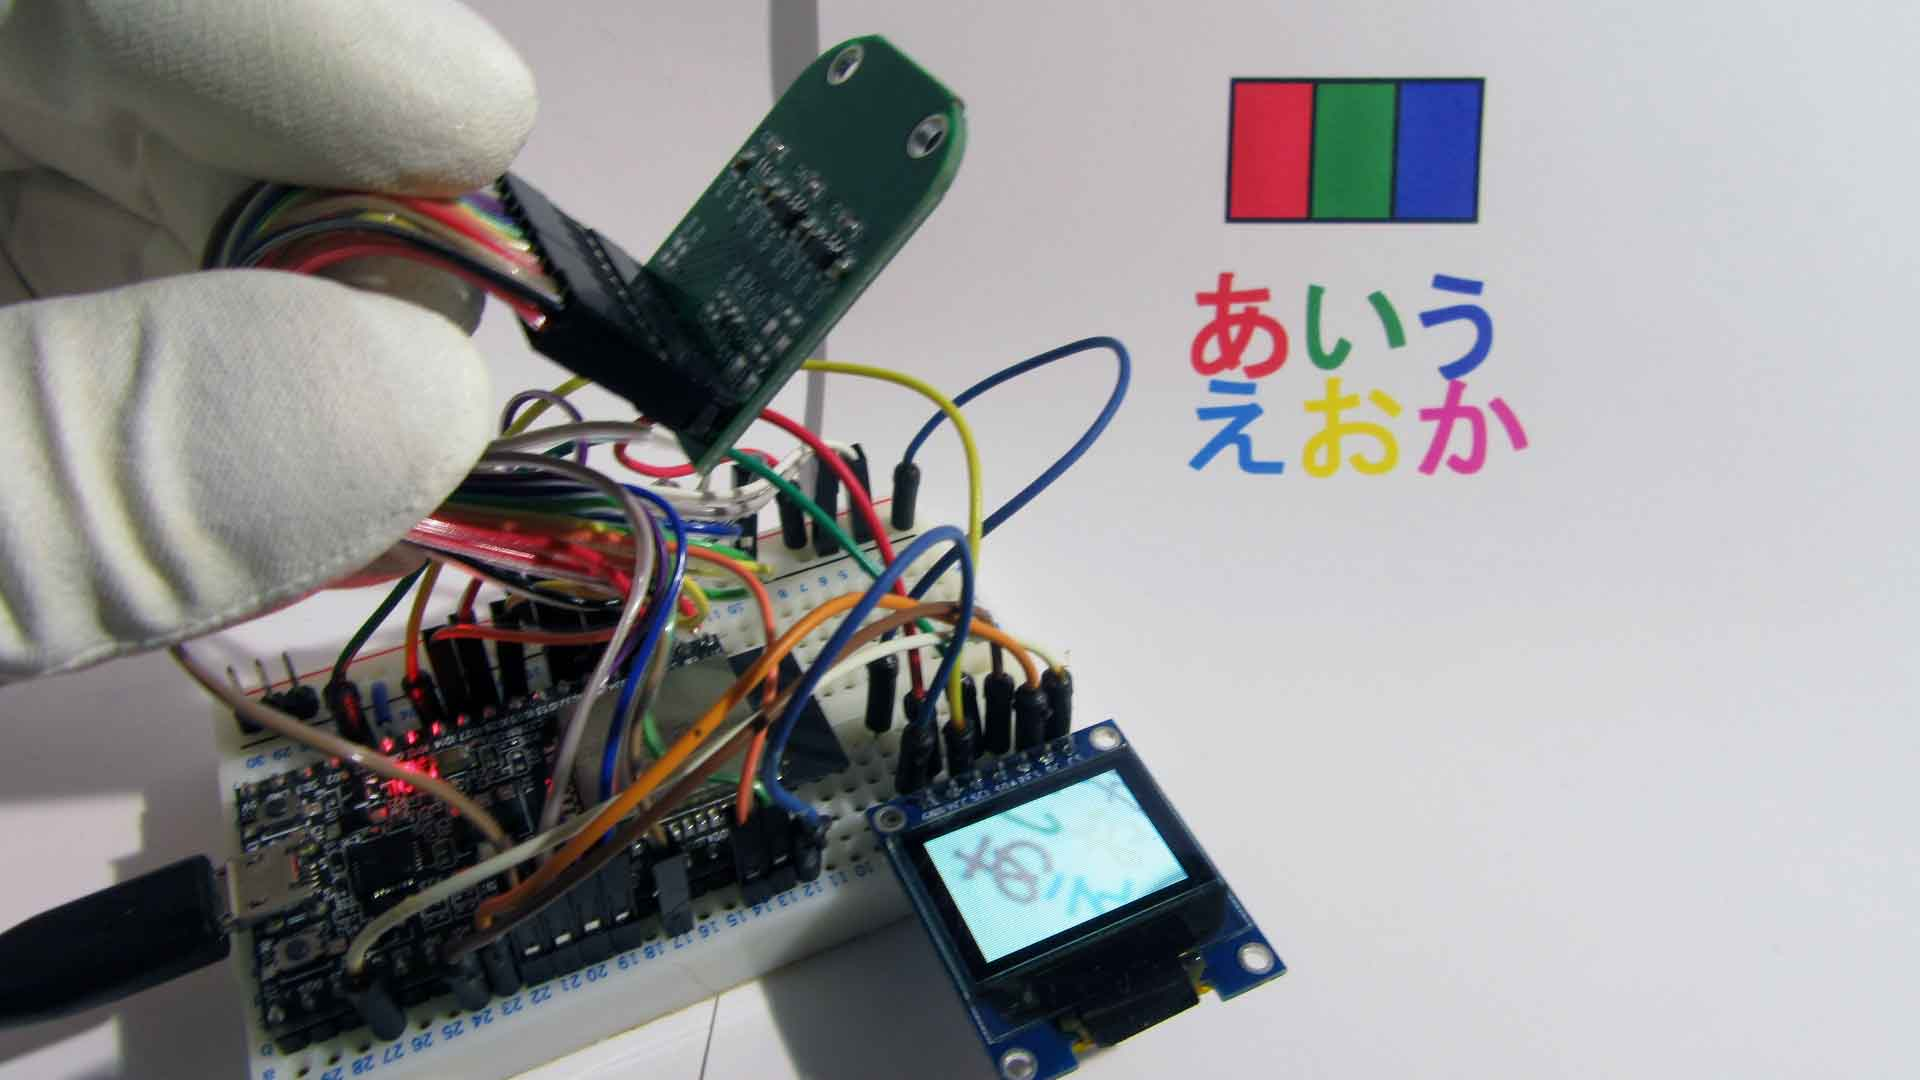 esp32-cameraライブラリを読み解く ~モジュール接続、動作チェック編~